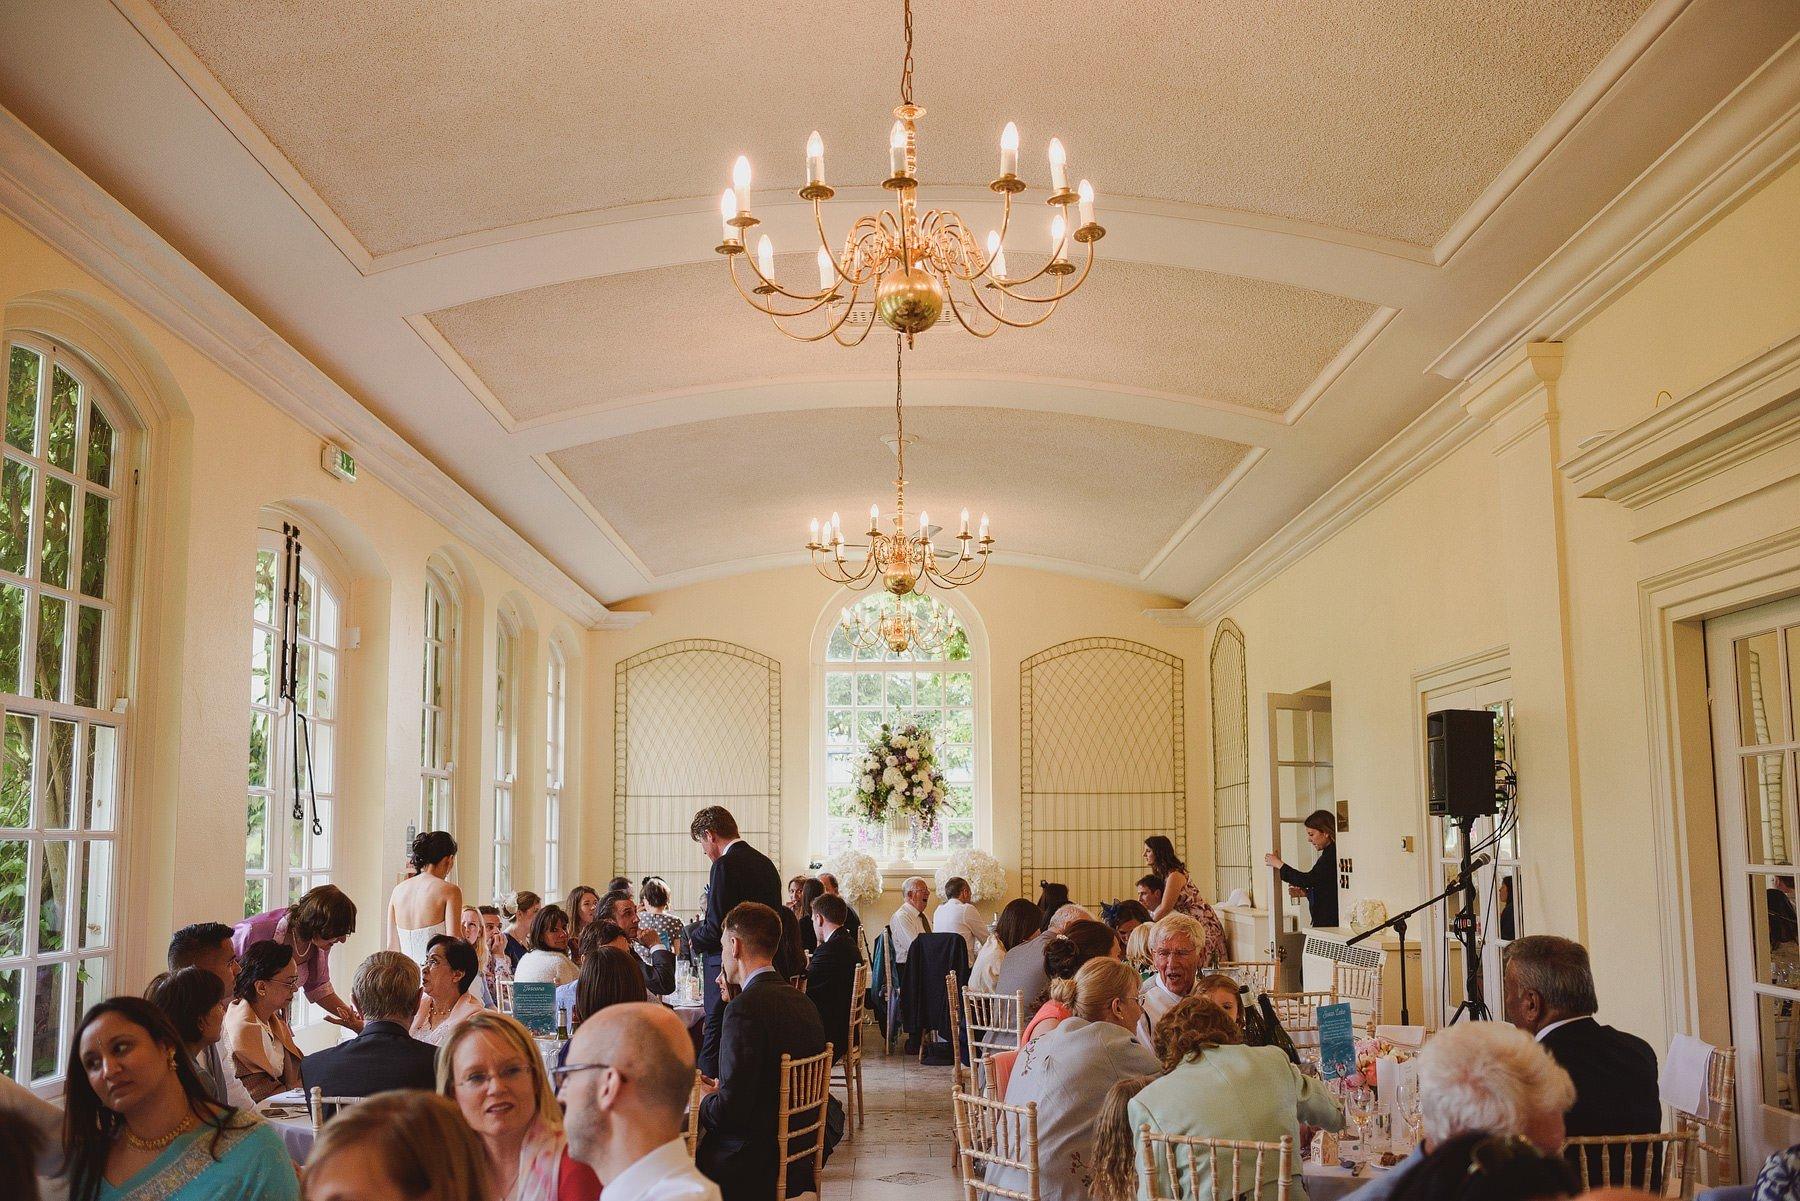 055-wedding-photos-at-goldney-hall-bristol.jpg